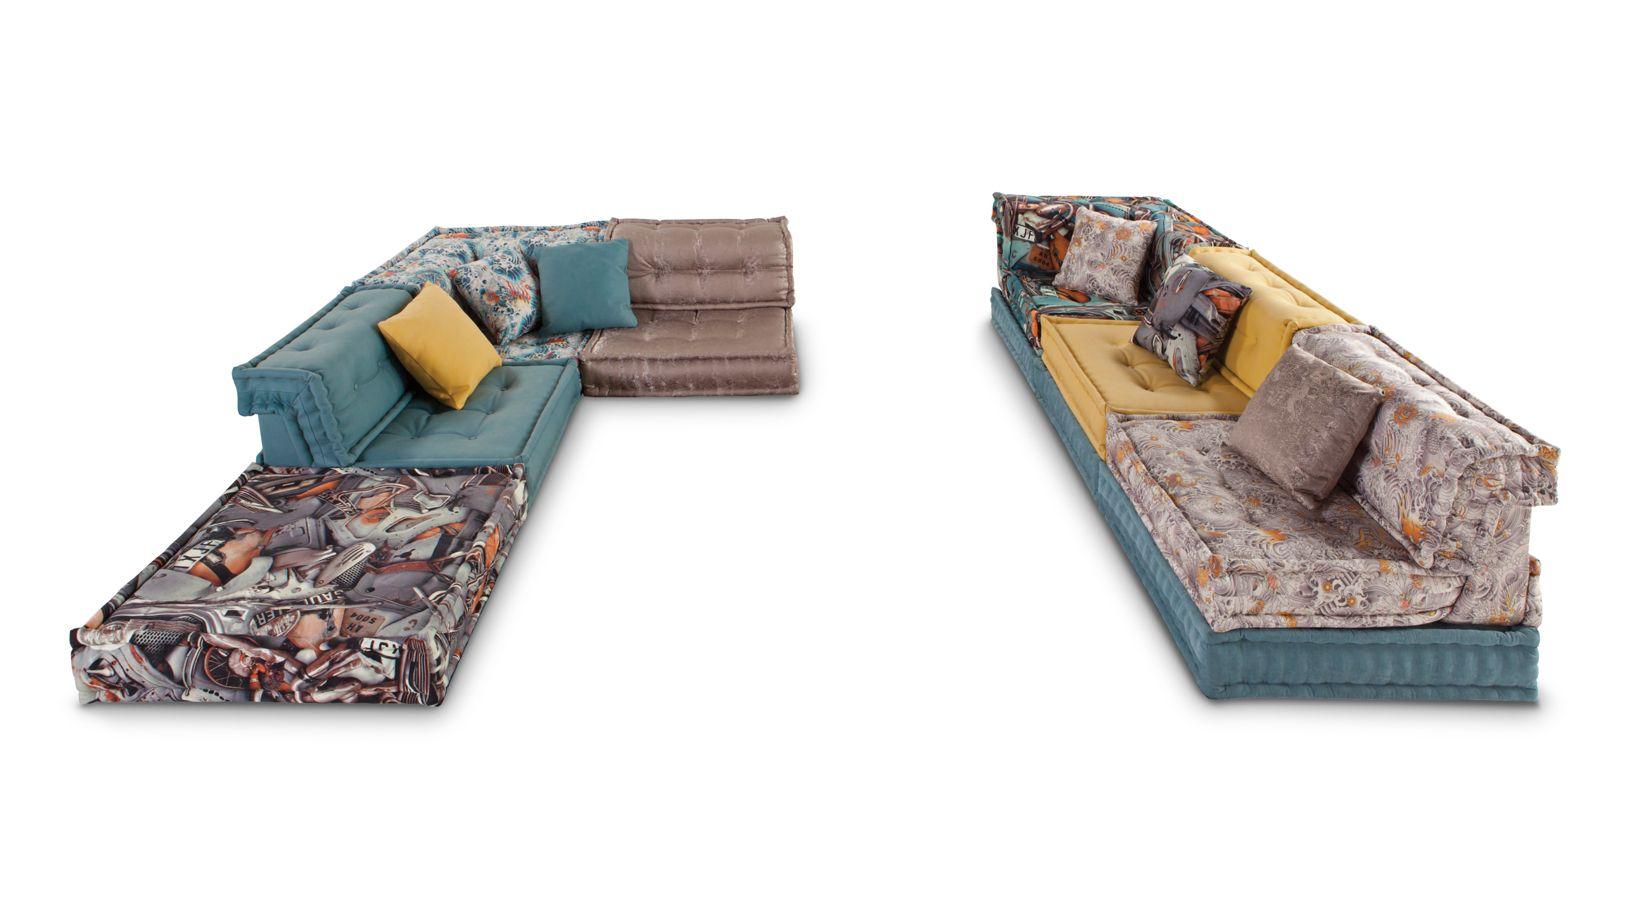 canap composable jean paul gaultier mah jong roche bobois. Black Bedroom Furniture Sets. Home Design Ideas